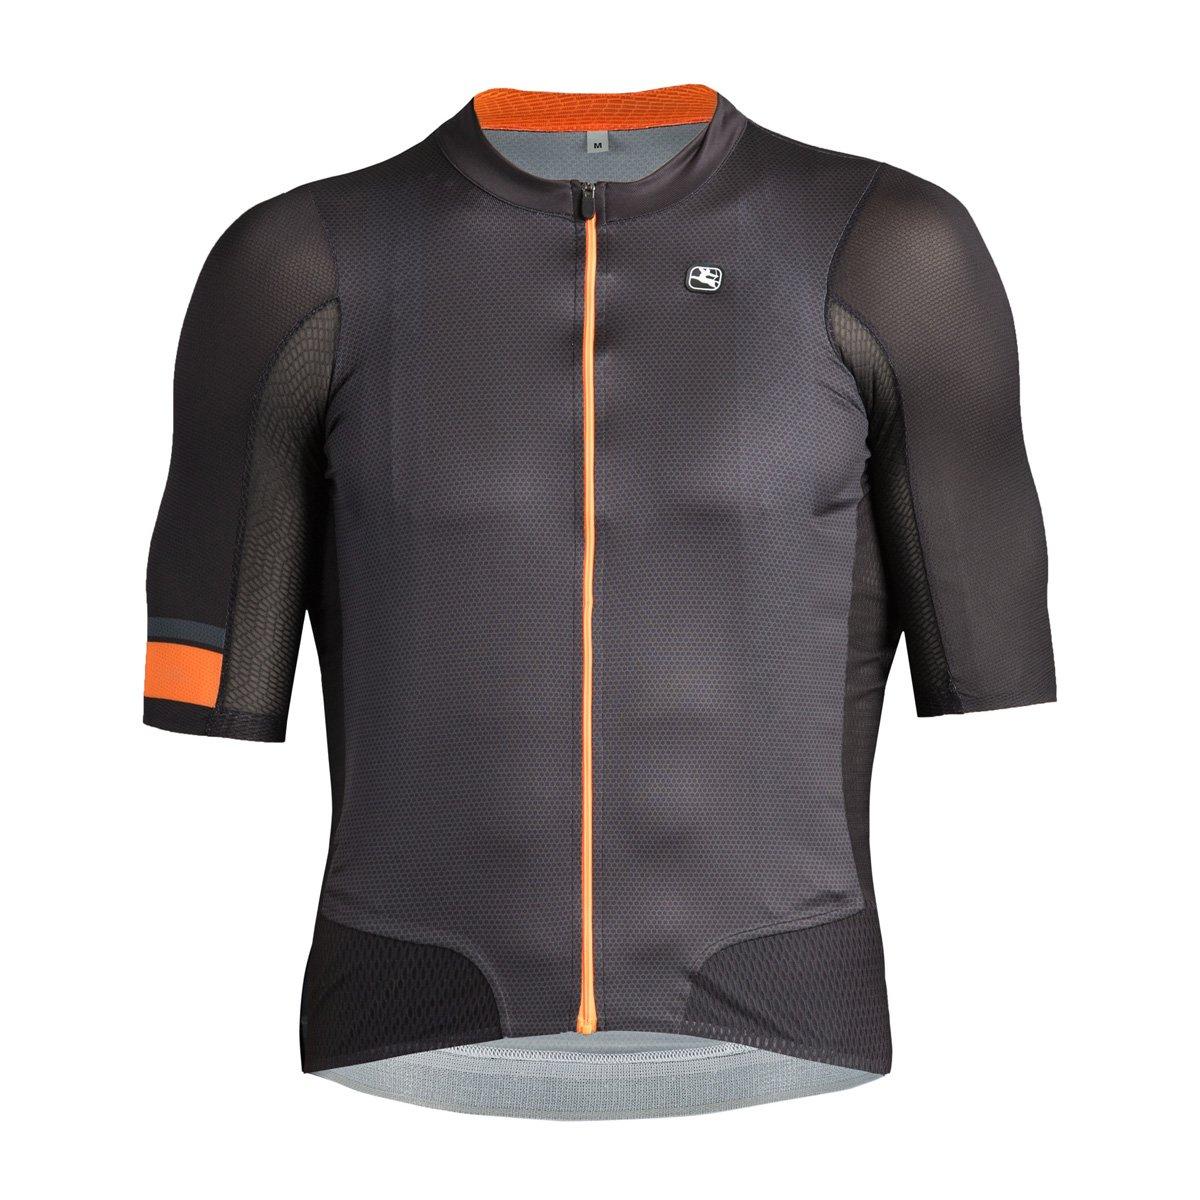 Giordana nx-g Air Road Bike Jersey – Men 's B07BDQ1FXL X-Large|チャコール/オレンジ チャコール/オレンジ X-Large